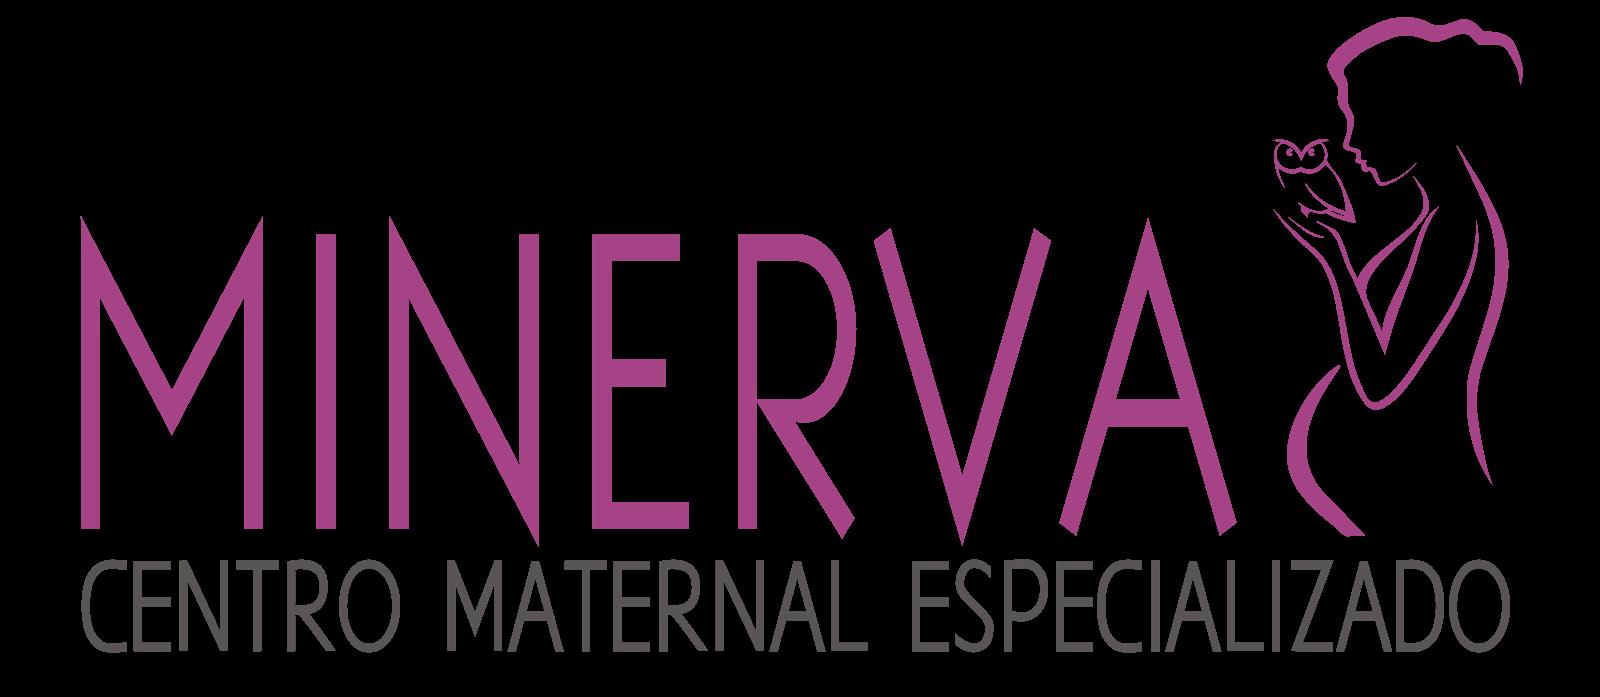 MINERVA Centro Maternal Especializado